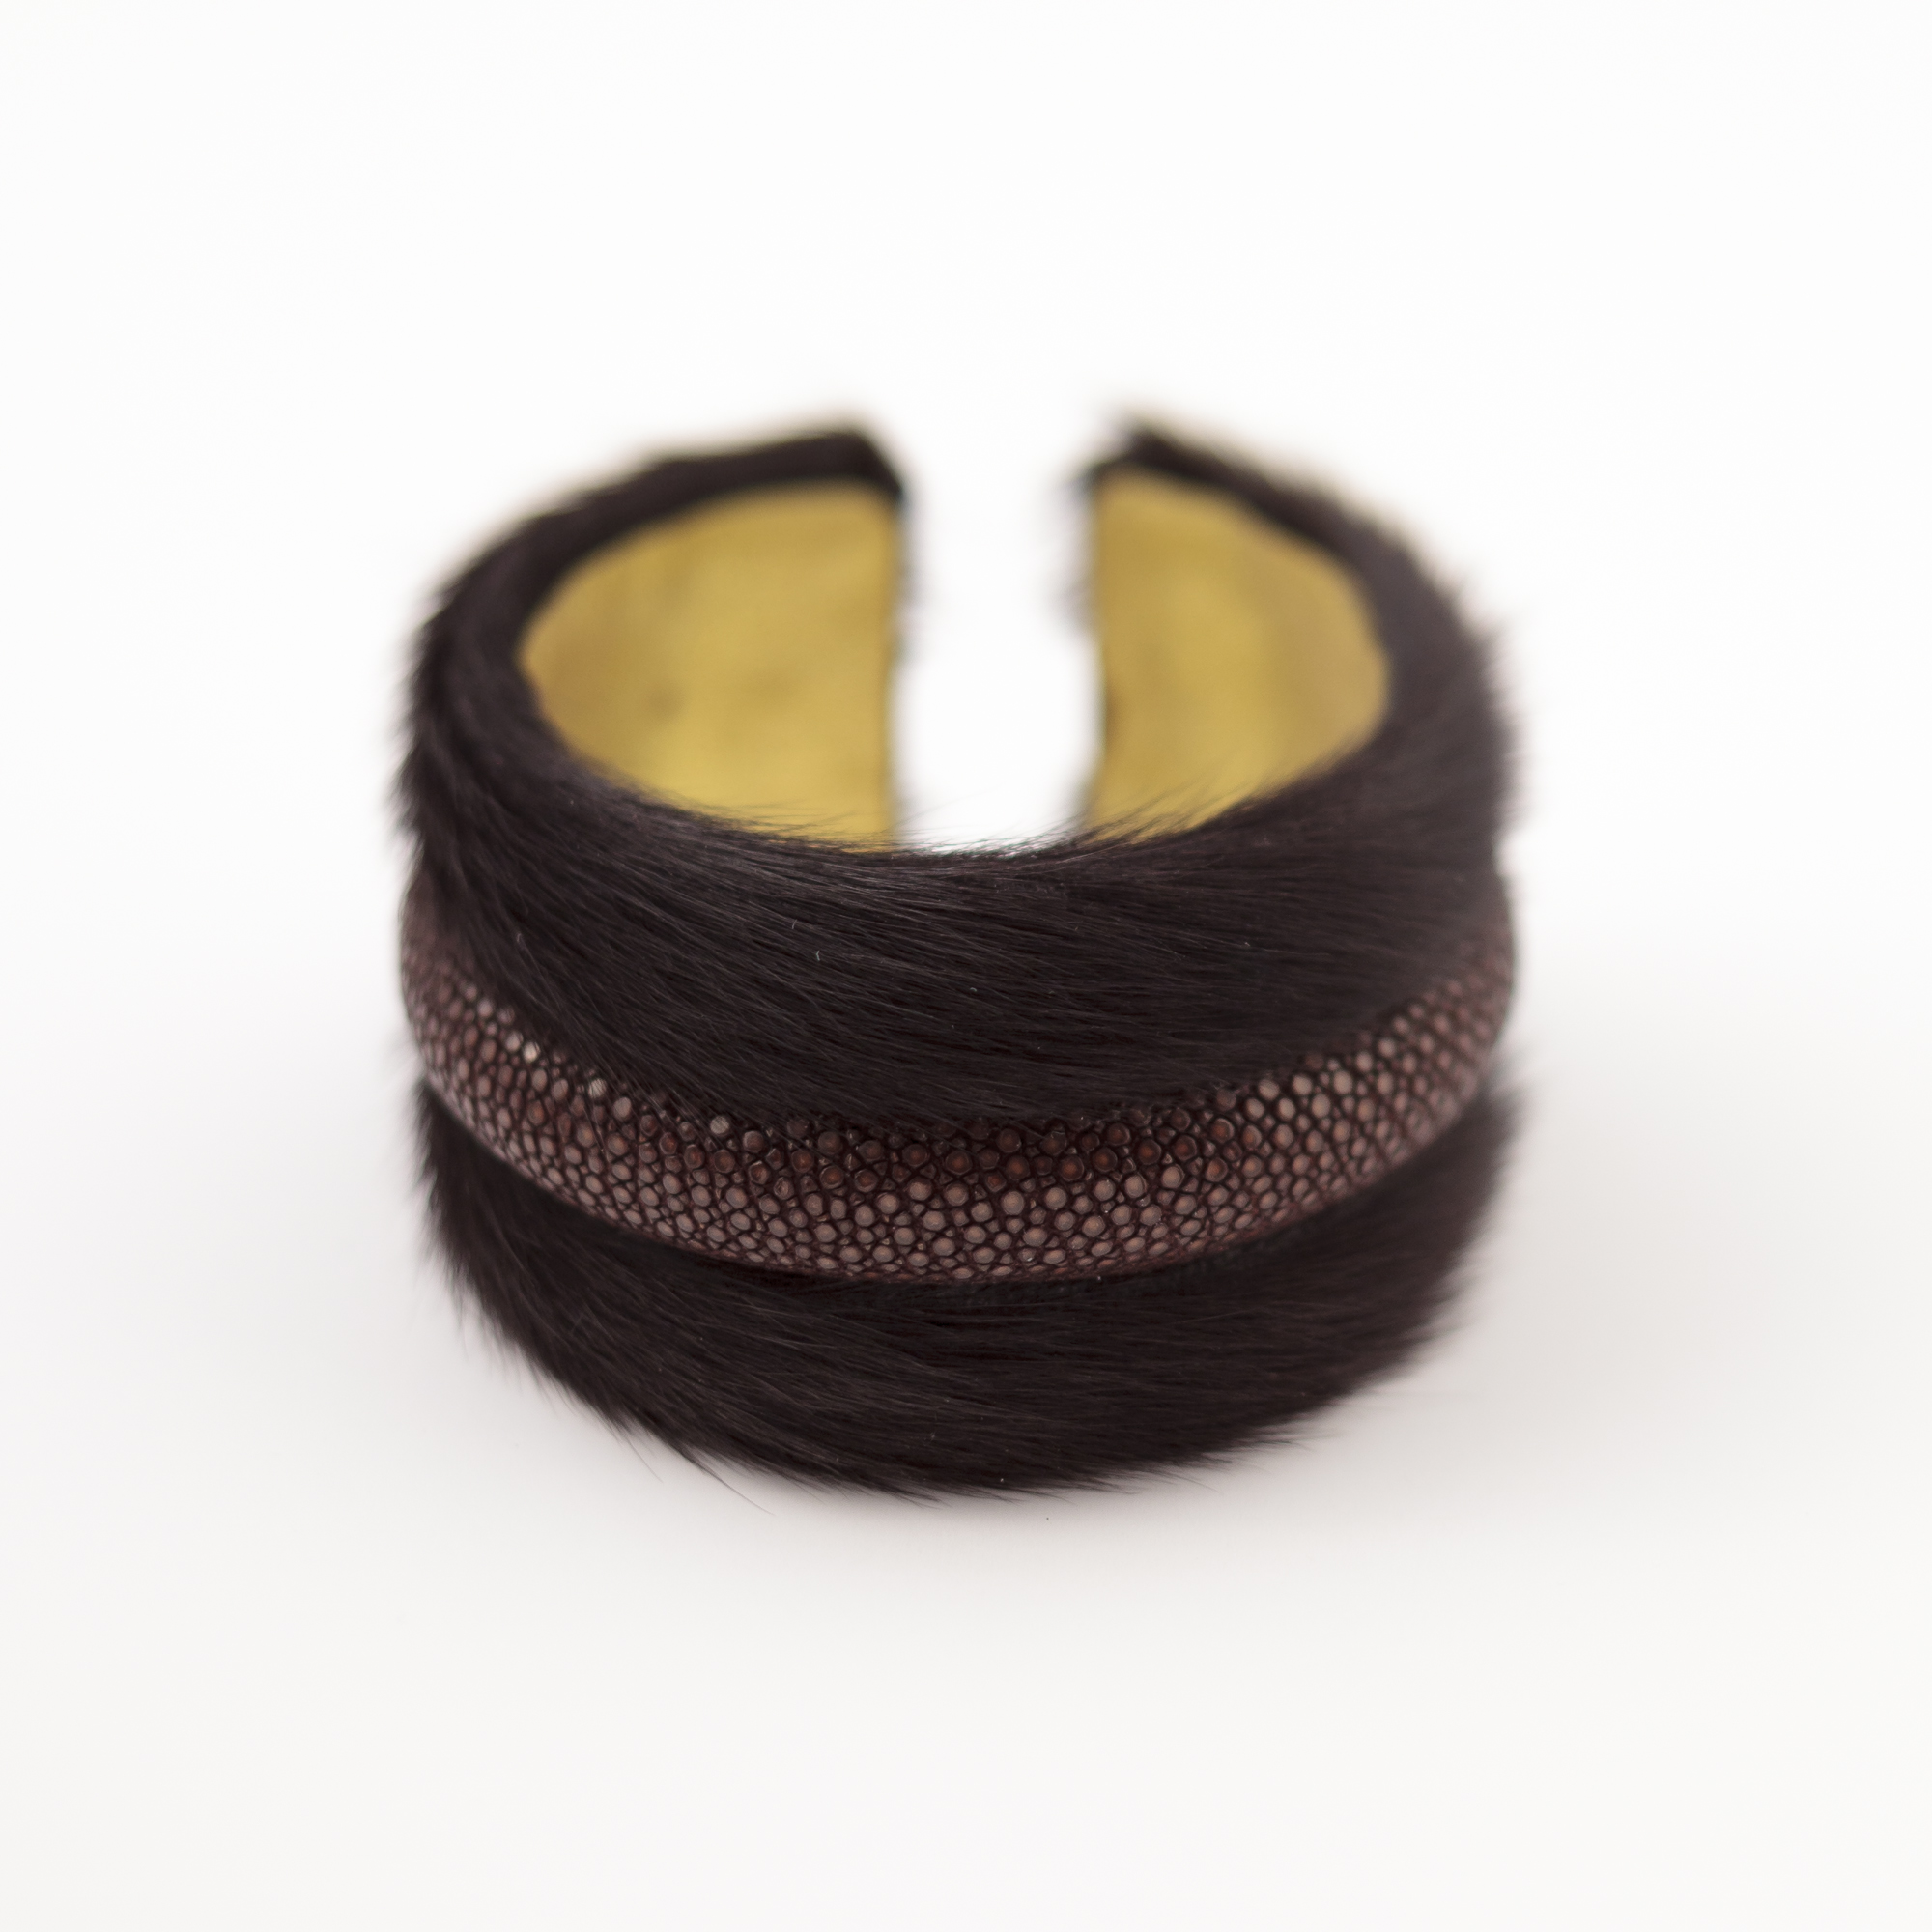 tresor-by-flore-galuchat-bracelet-poilu-brun-chocolat